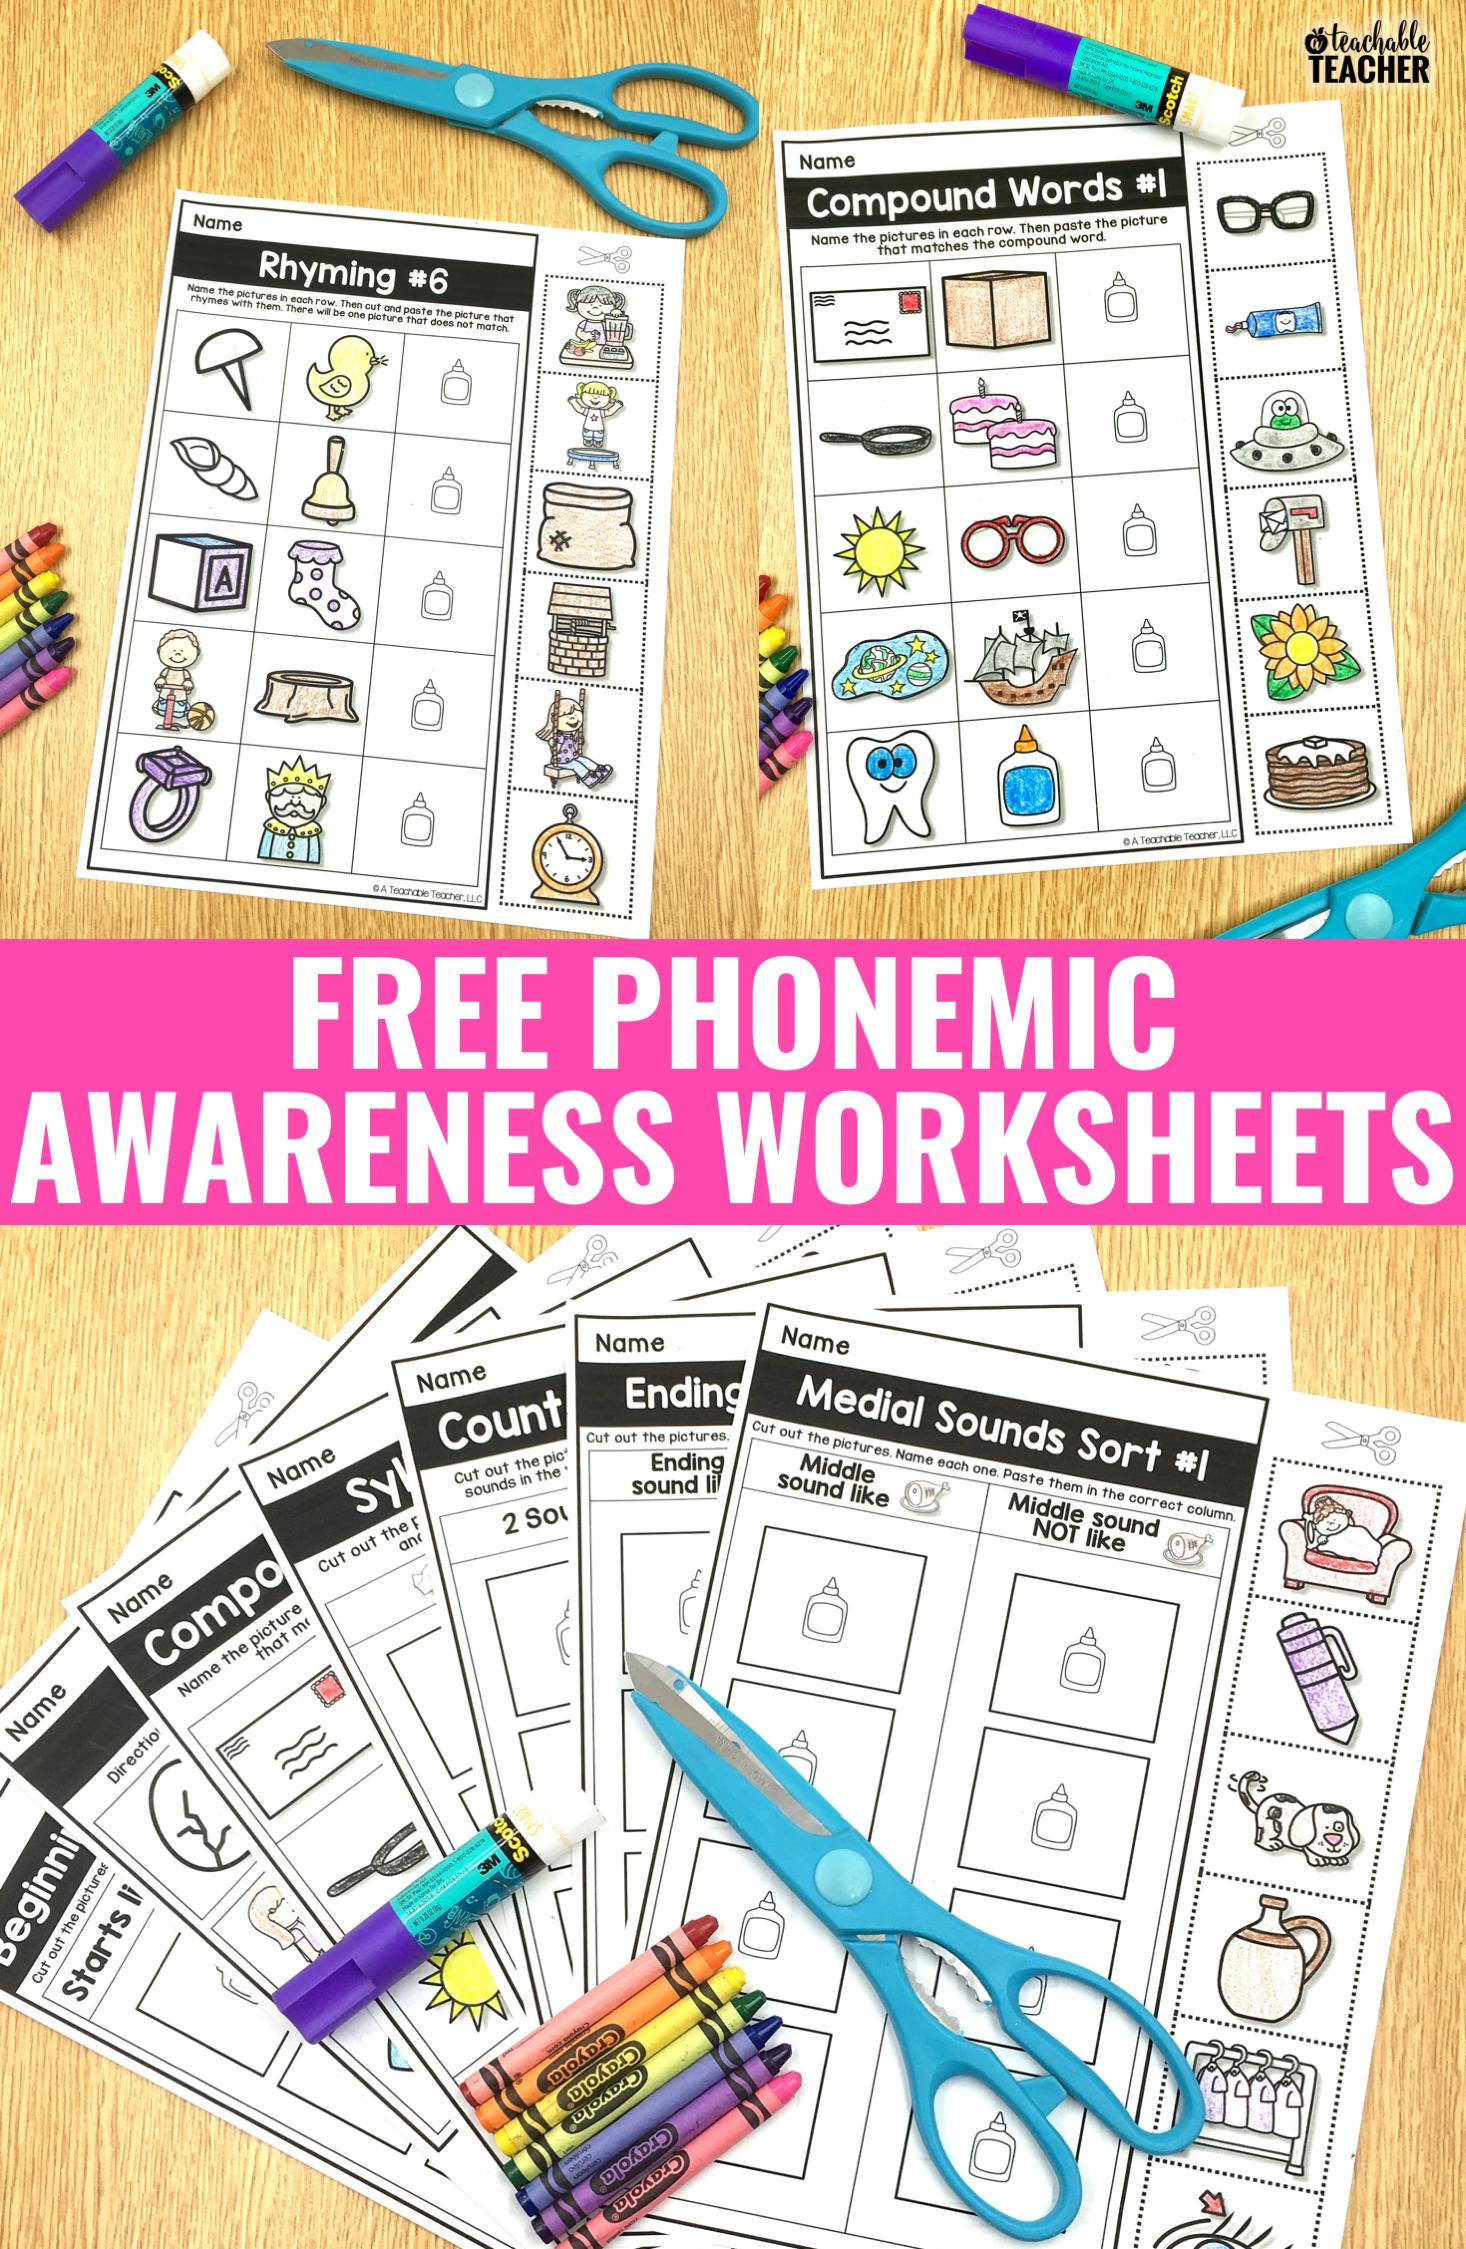 medium resolution of FREE Phonemic Awareness Worksheets - Interactive and Picture-Based   Phonemic  awareness